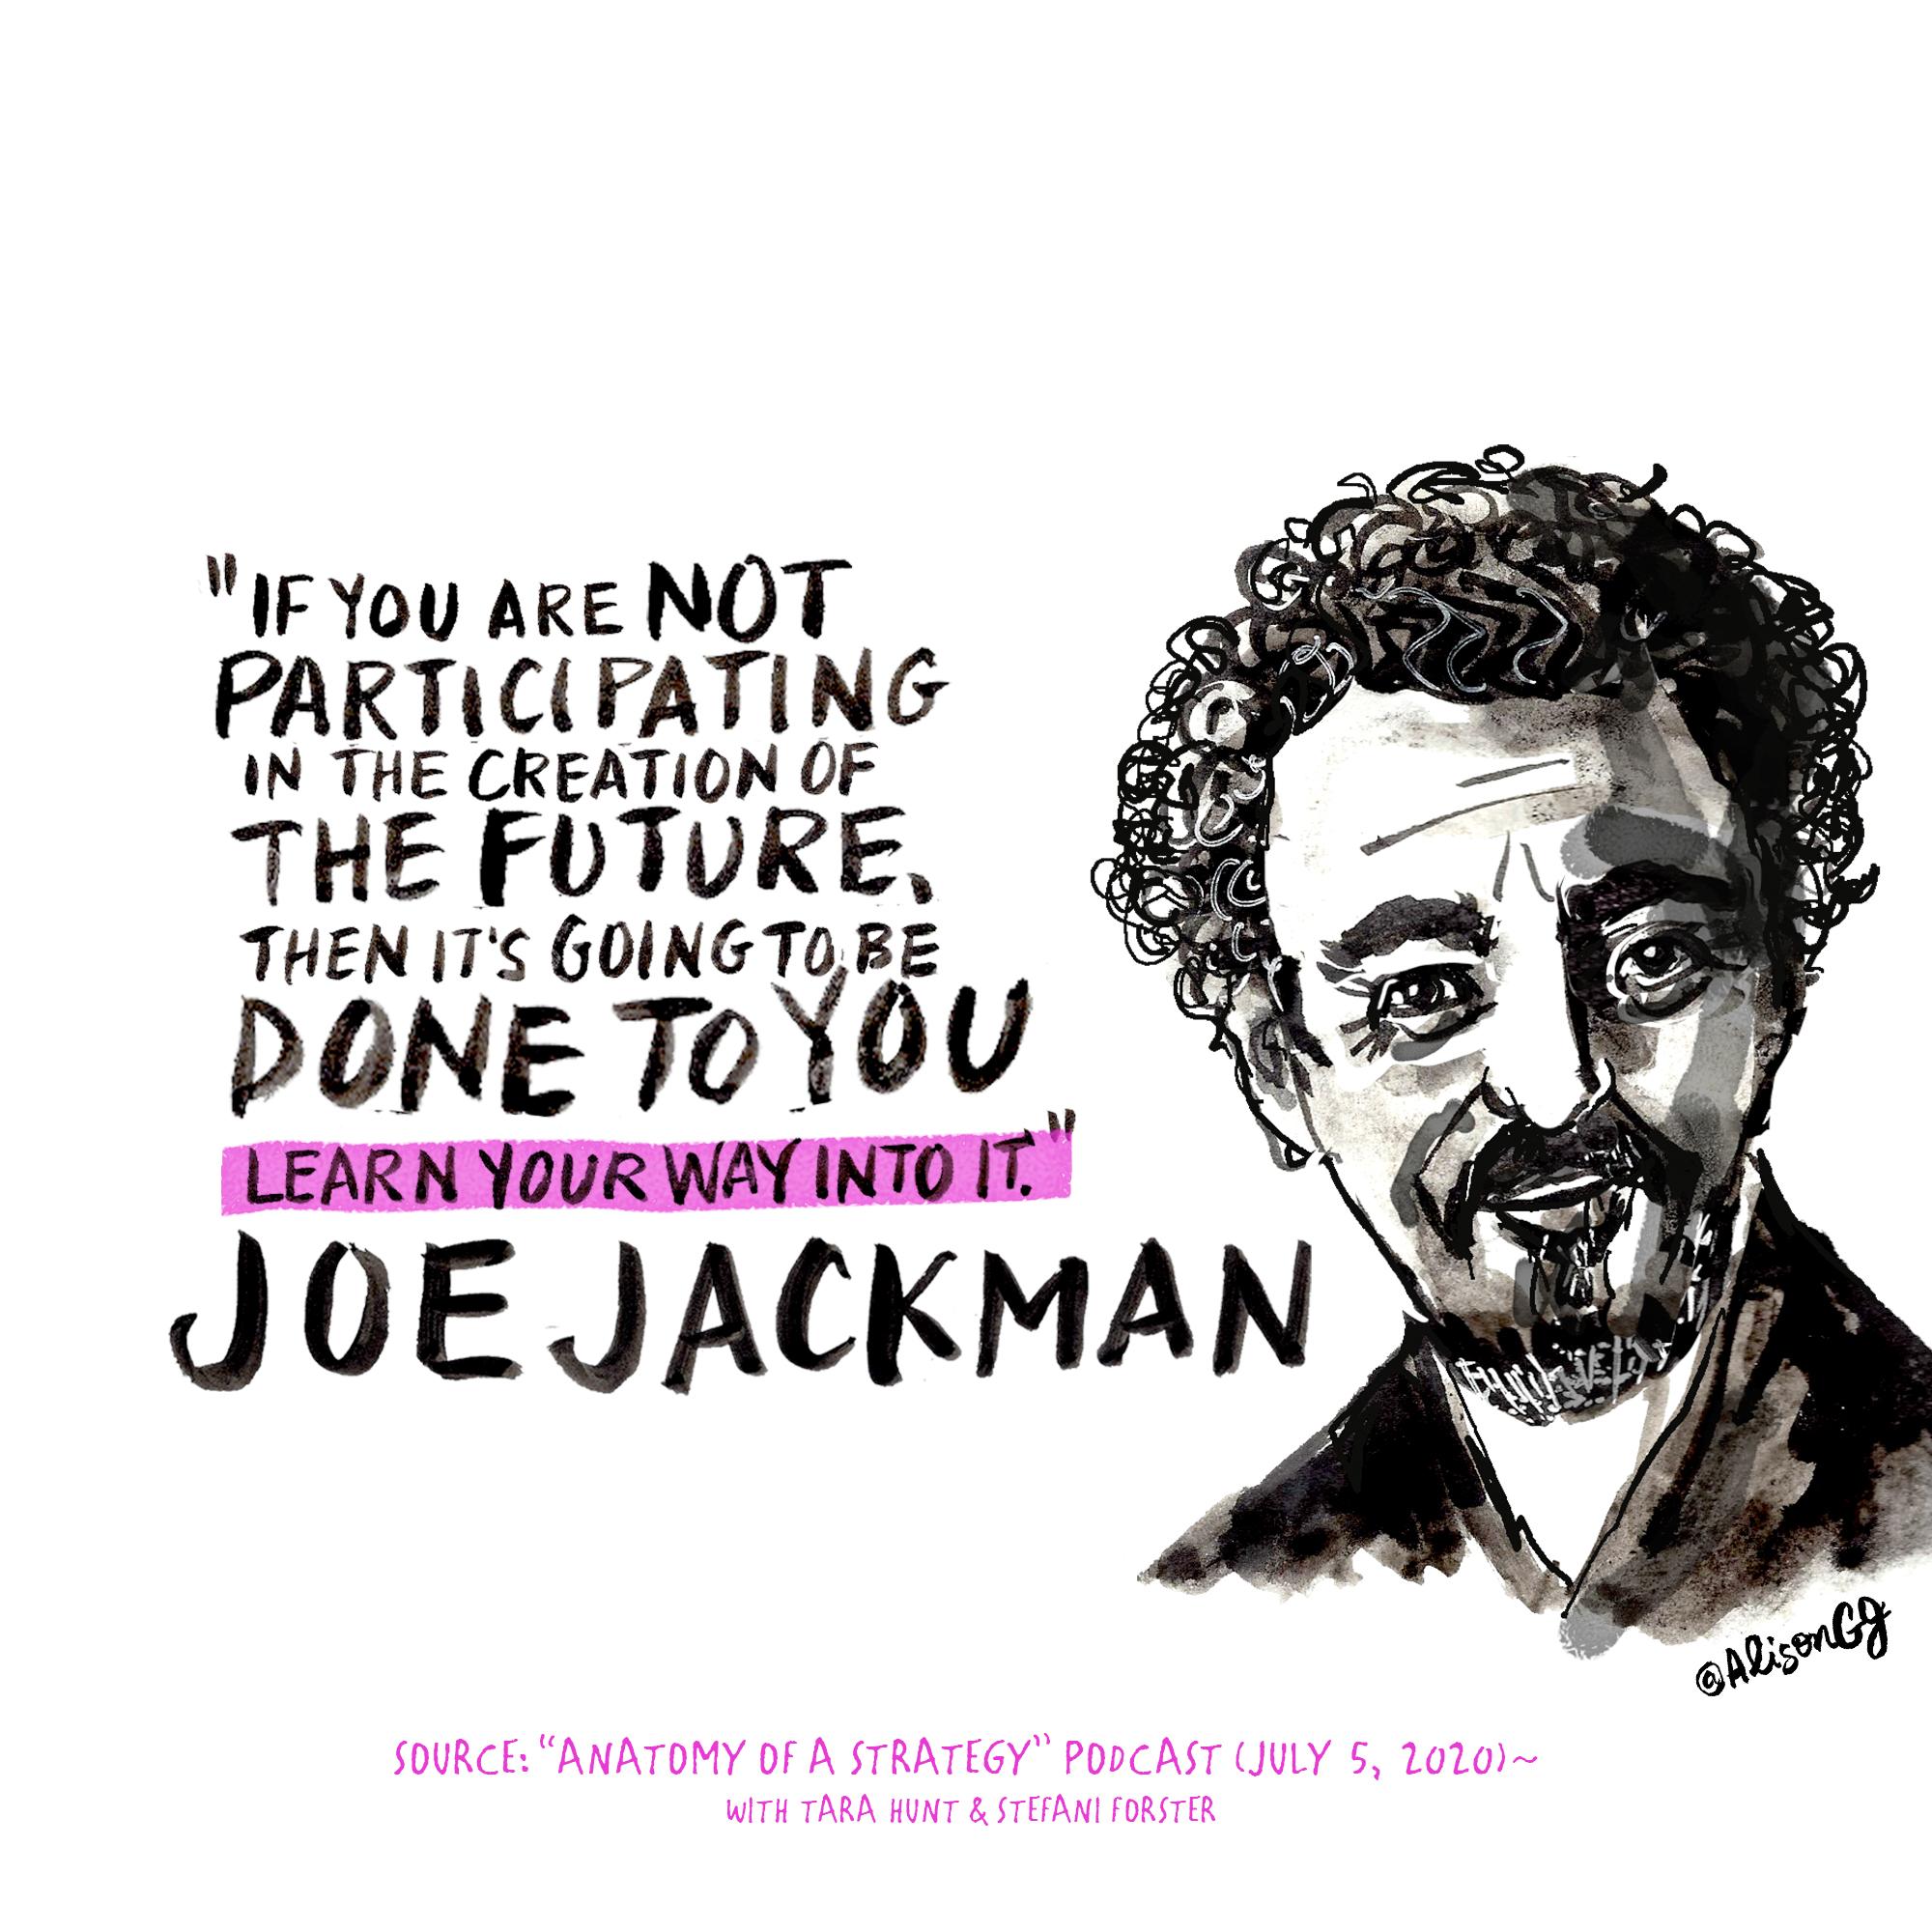 Joe Jackman, The Reinventionist